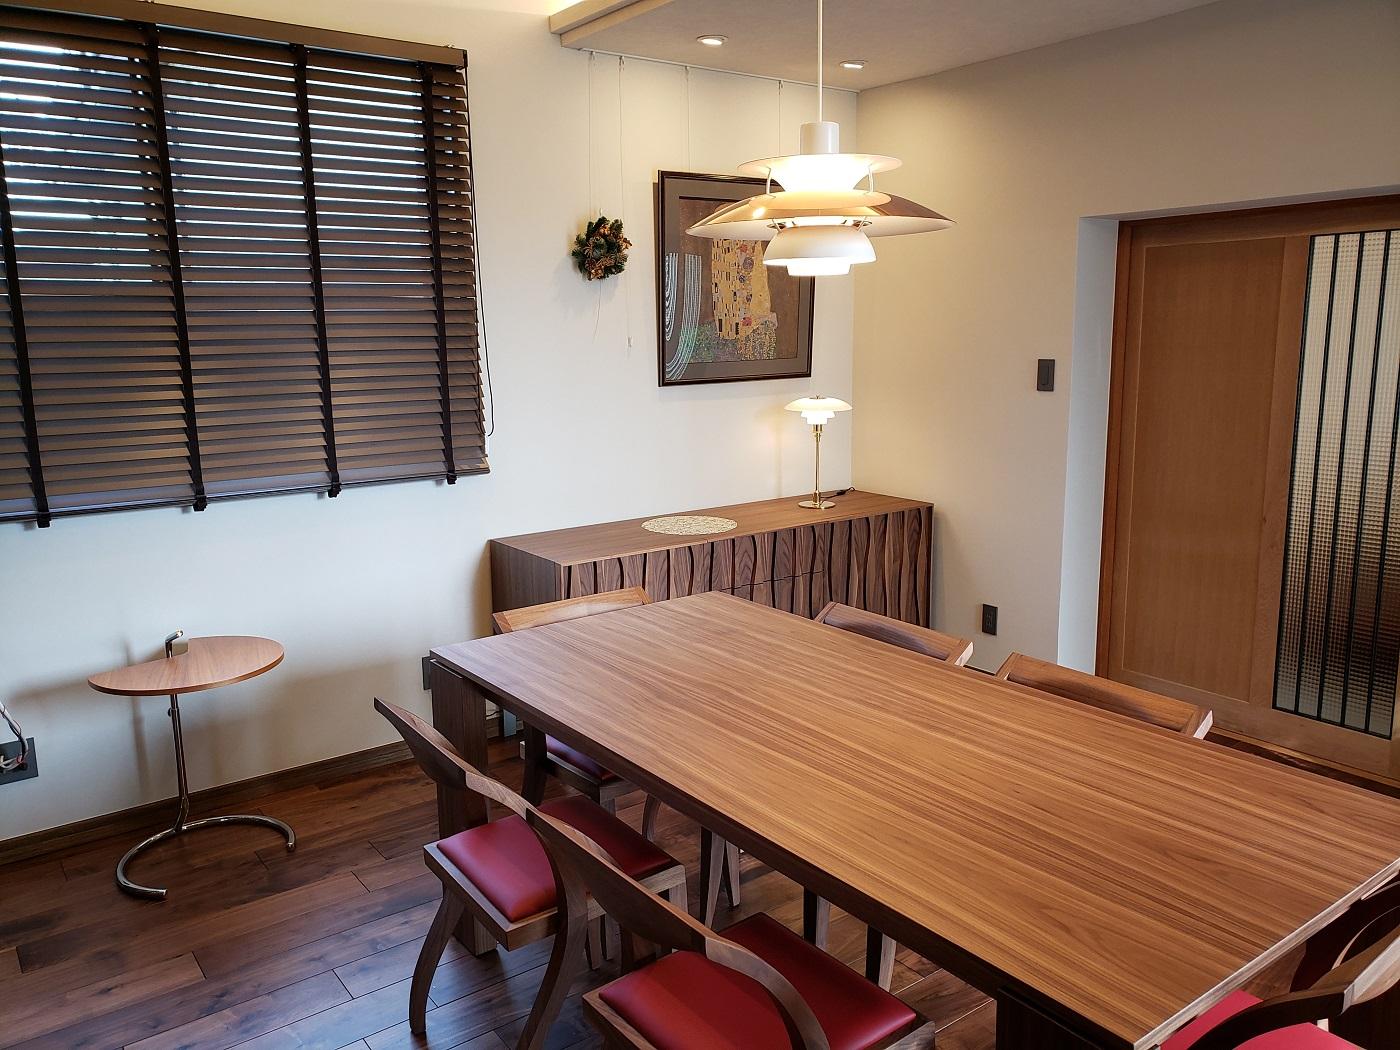 K様 / ポラダ ケビンダイニングテーブル、アーレキンチェア、マサイチェスト